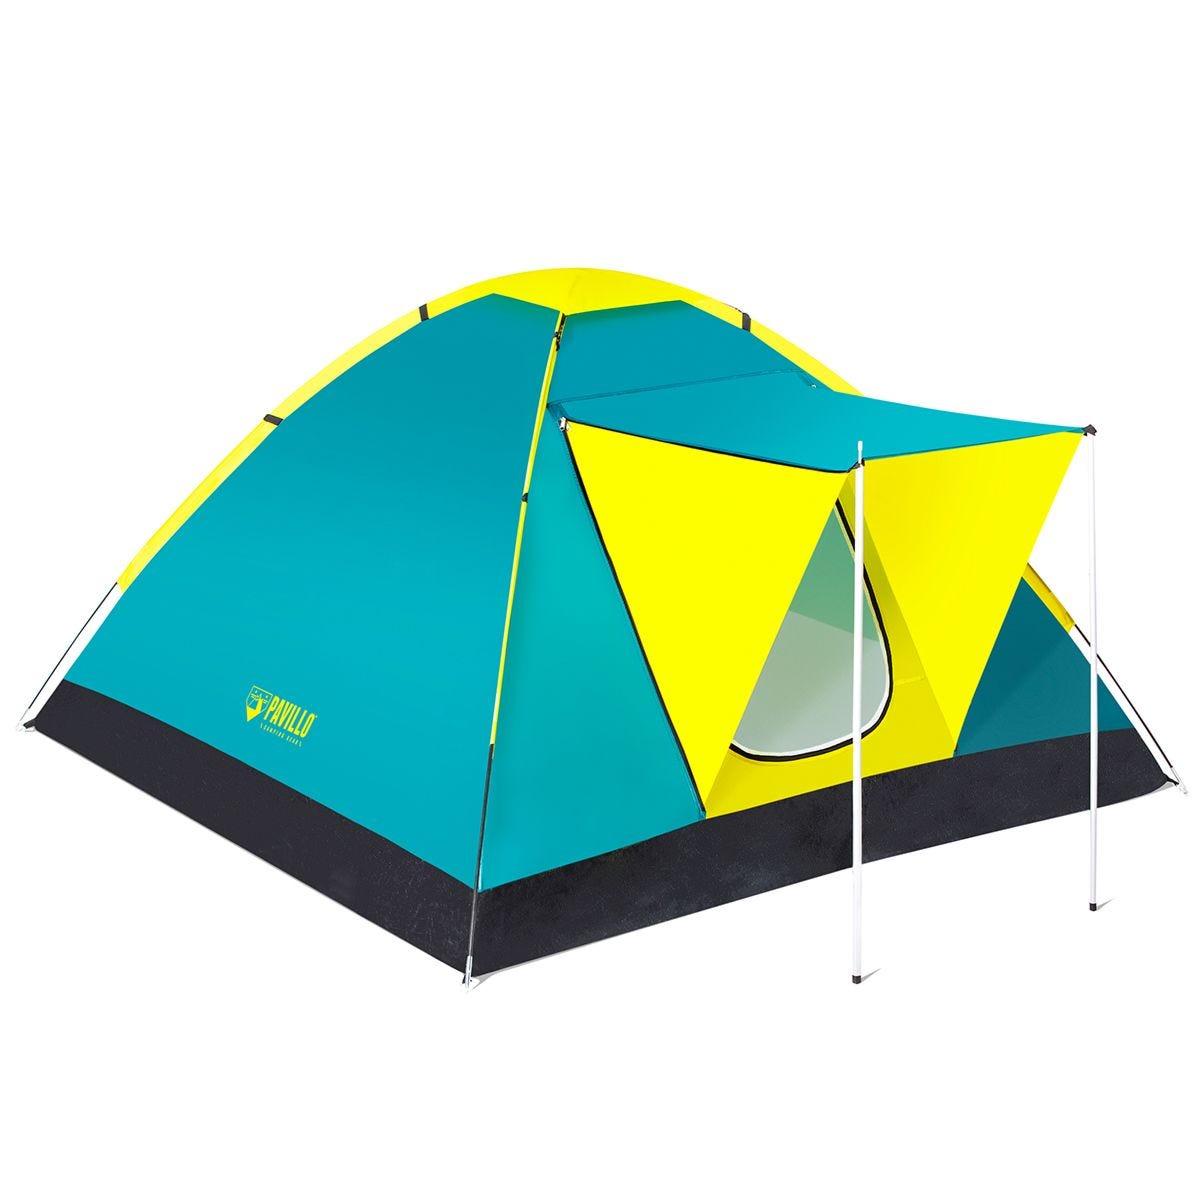 Pavillo Coolground 3 Person Tent - 2.10 x 2.10 x 1.20m